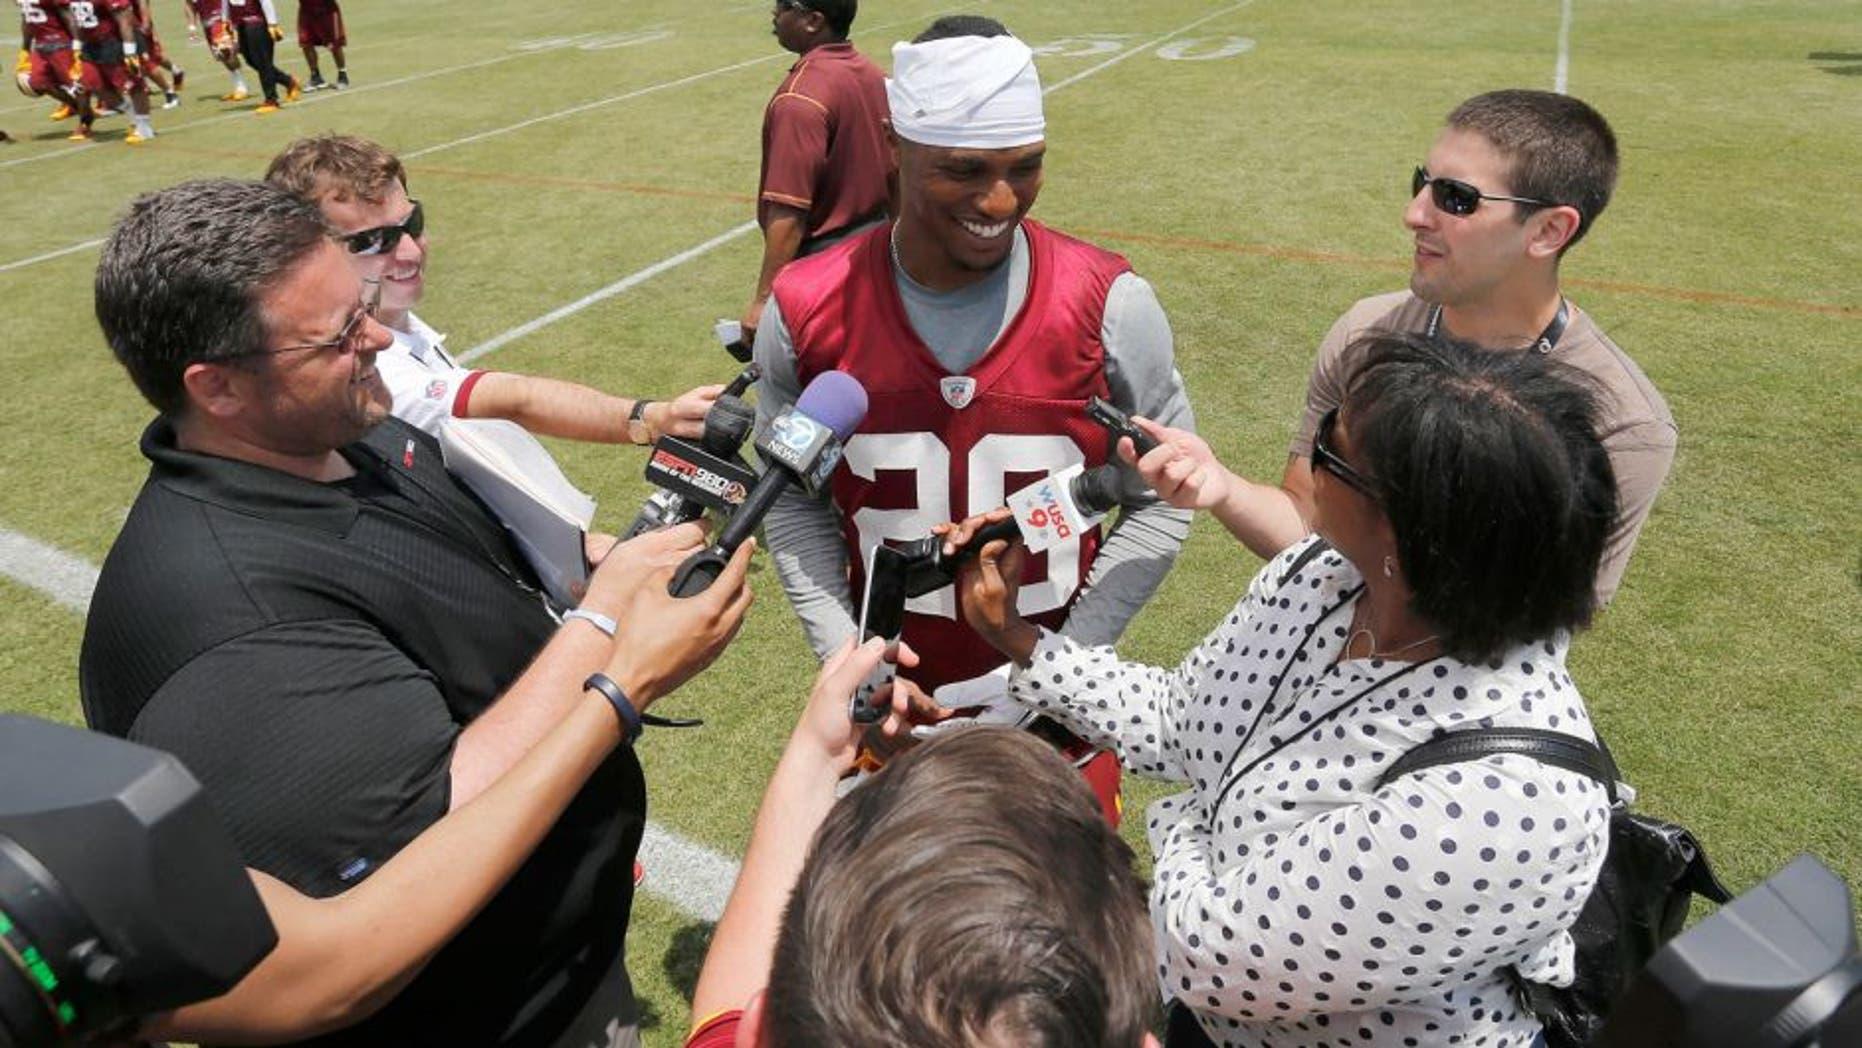 May 26, 2015; Ashbury, VA, USA; Washington Redskins cornerback Chris Culliver (29) speaks with the media after the Redskins OTA at Redskins Park. Mandatory Credit: Geoff Burke-USA TODAY Sports